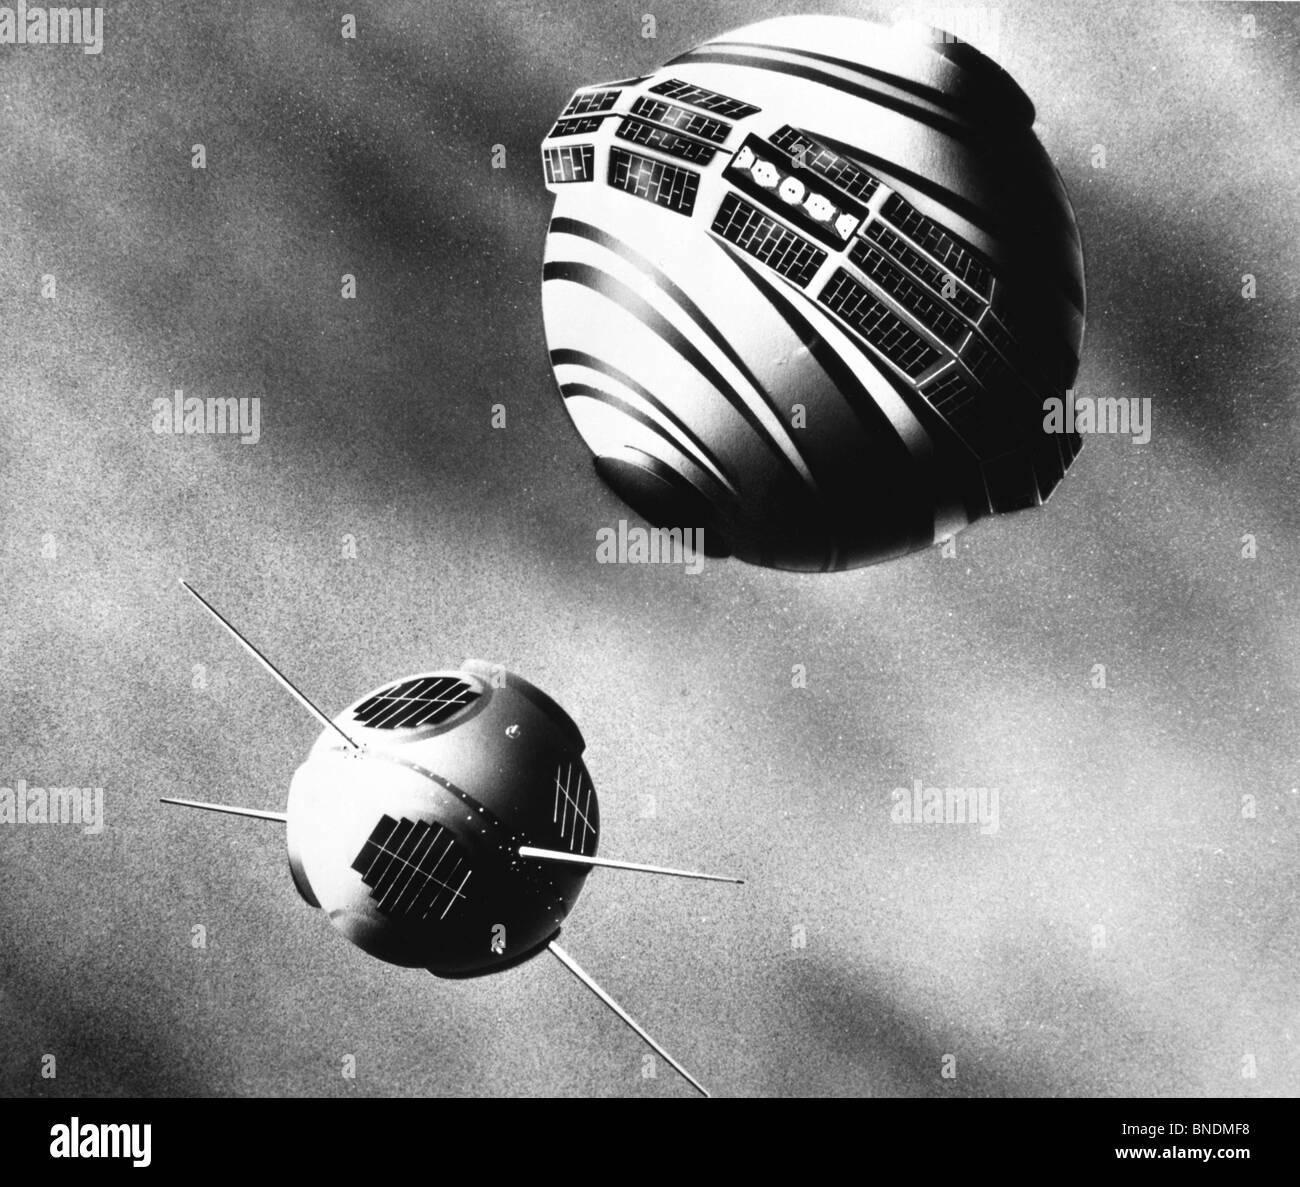 Two satellites orbiting in space, Transit 2A Satellite, Solar Radiation Measurement Satellite, US Navy - Stock Image